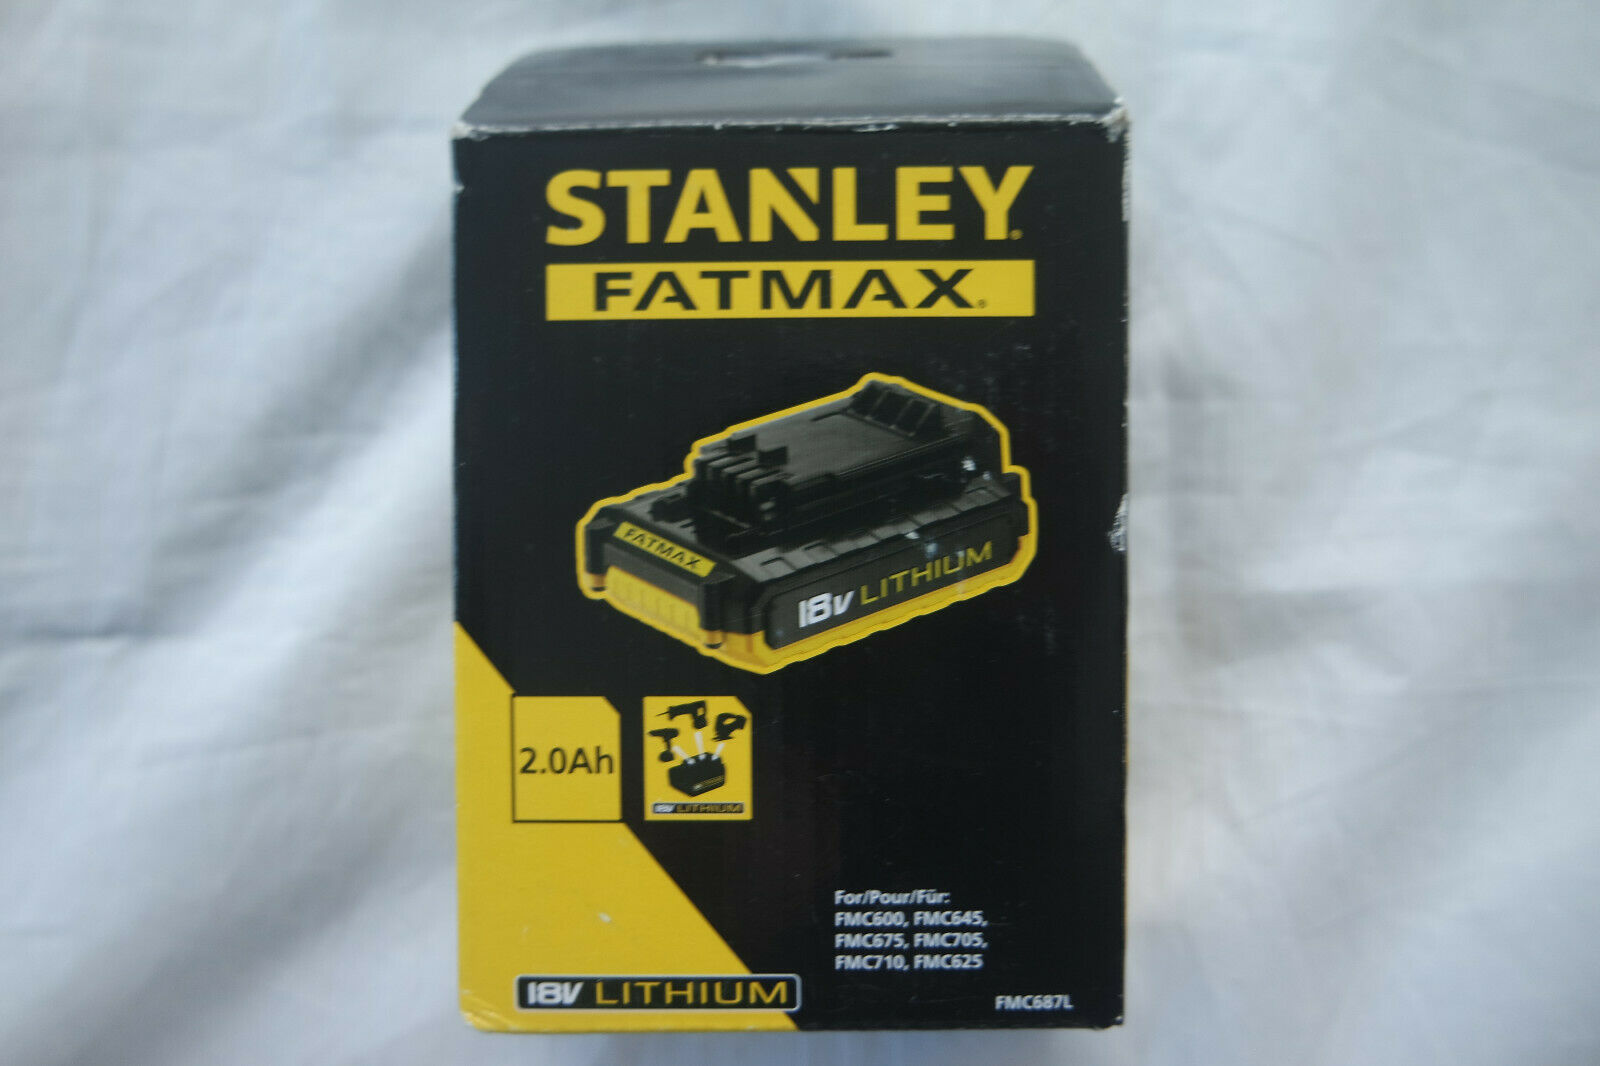 STANLEY-FMC687L FATMAX-XJ 2,0 Ah-Ion Akku, 18 V